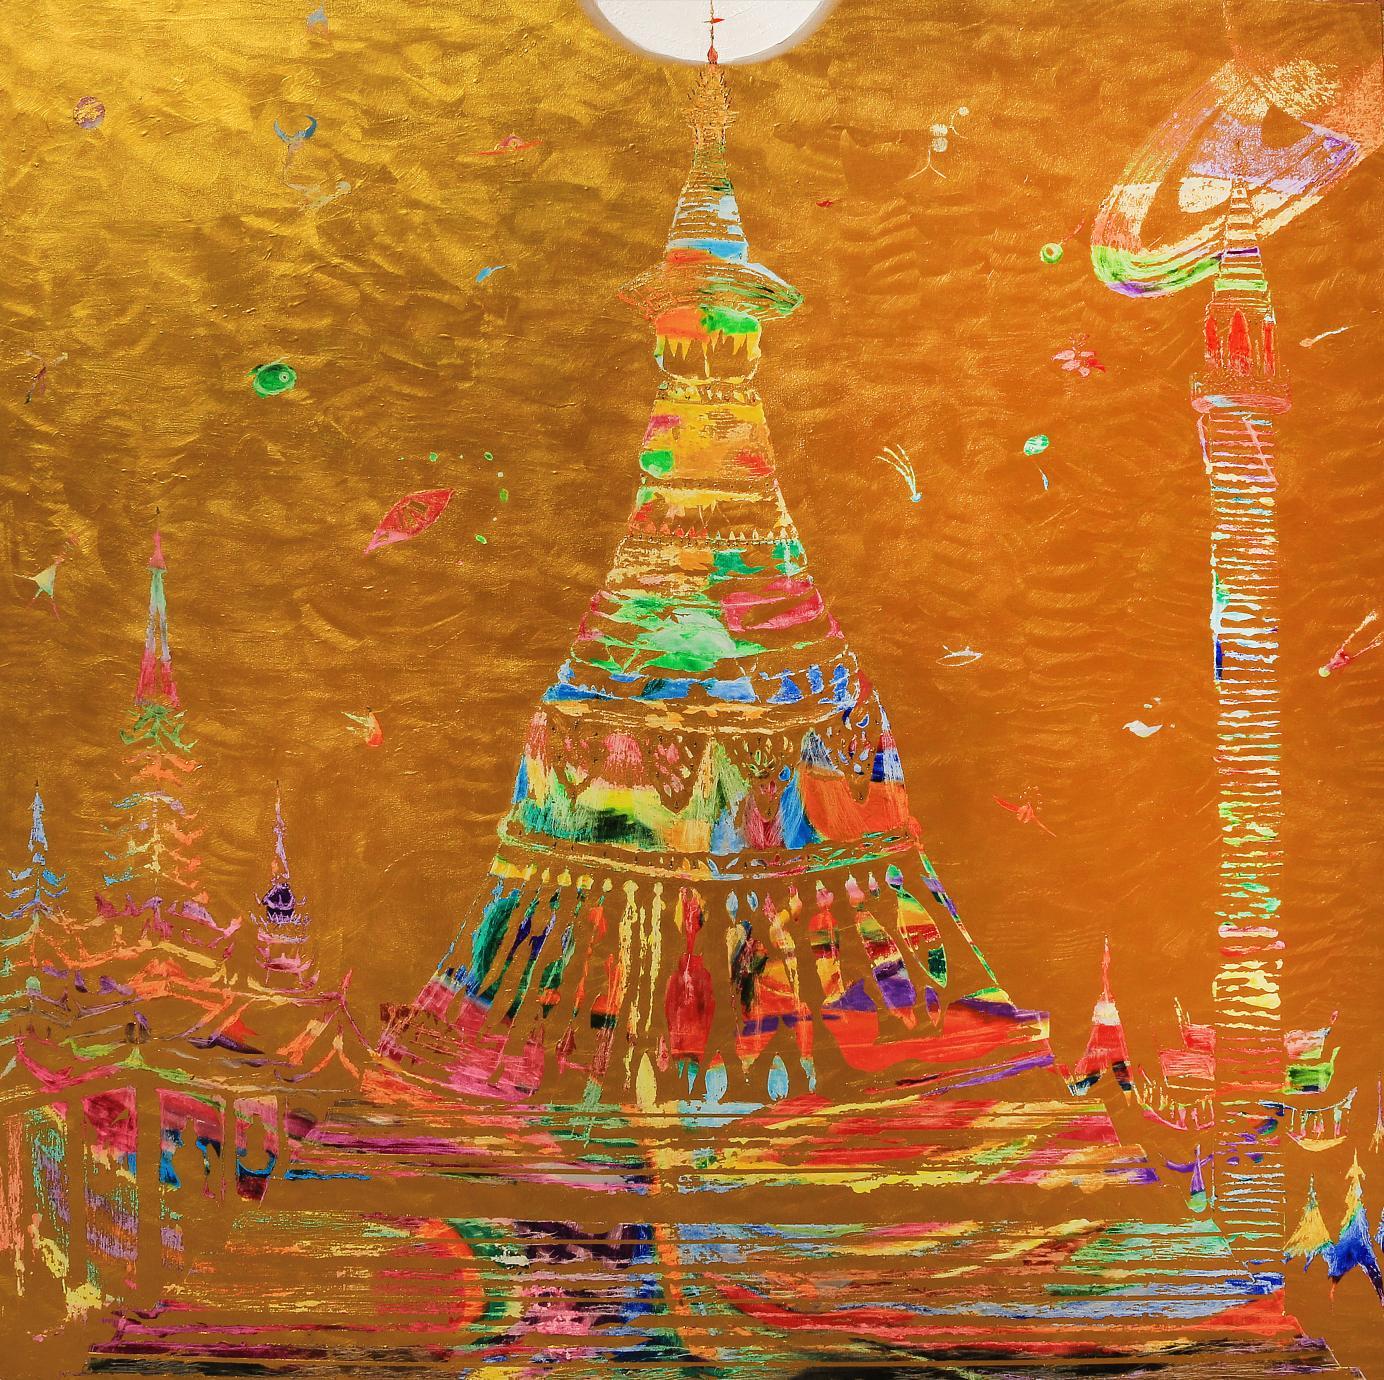 Shwedagon Zedi Daw (2019) - Arturo Prins